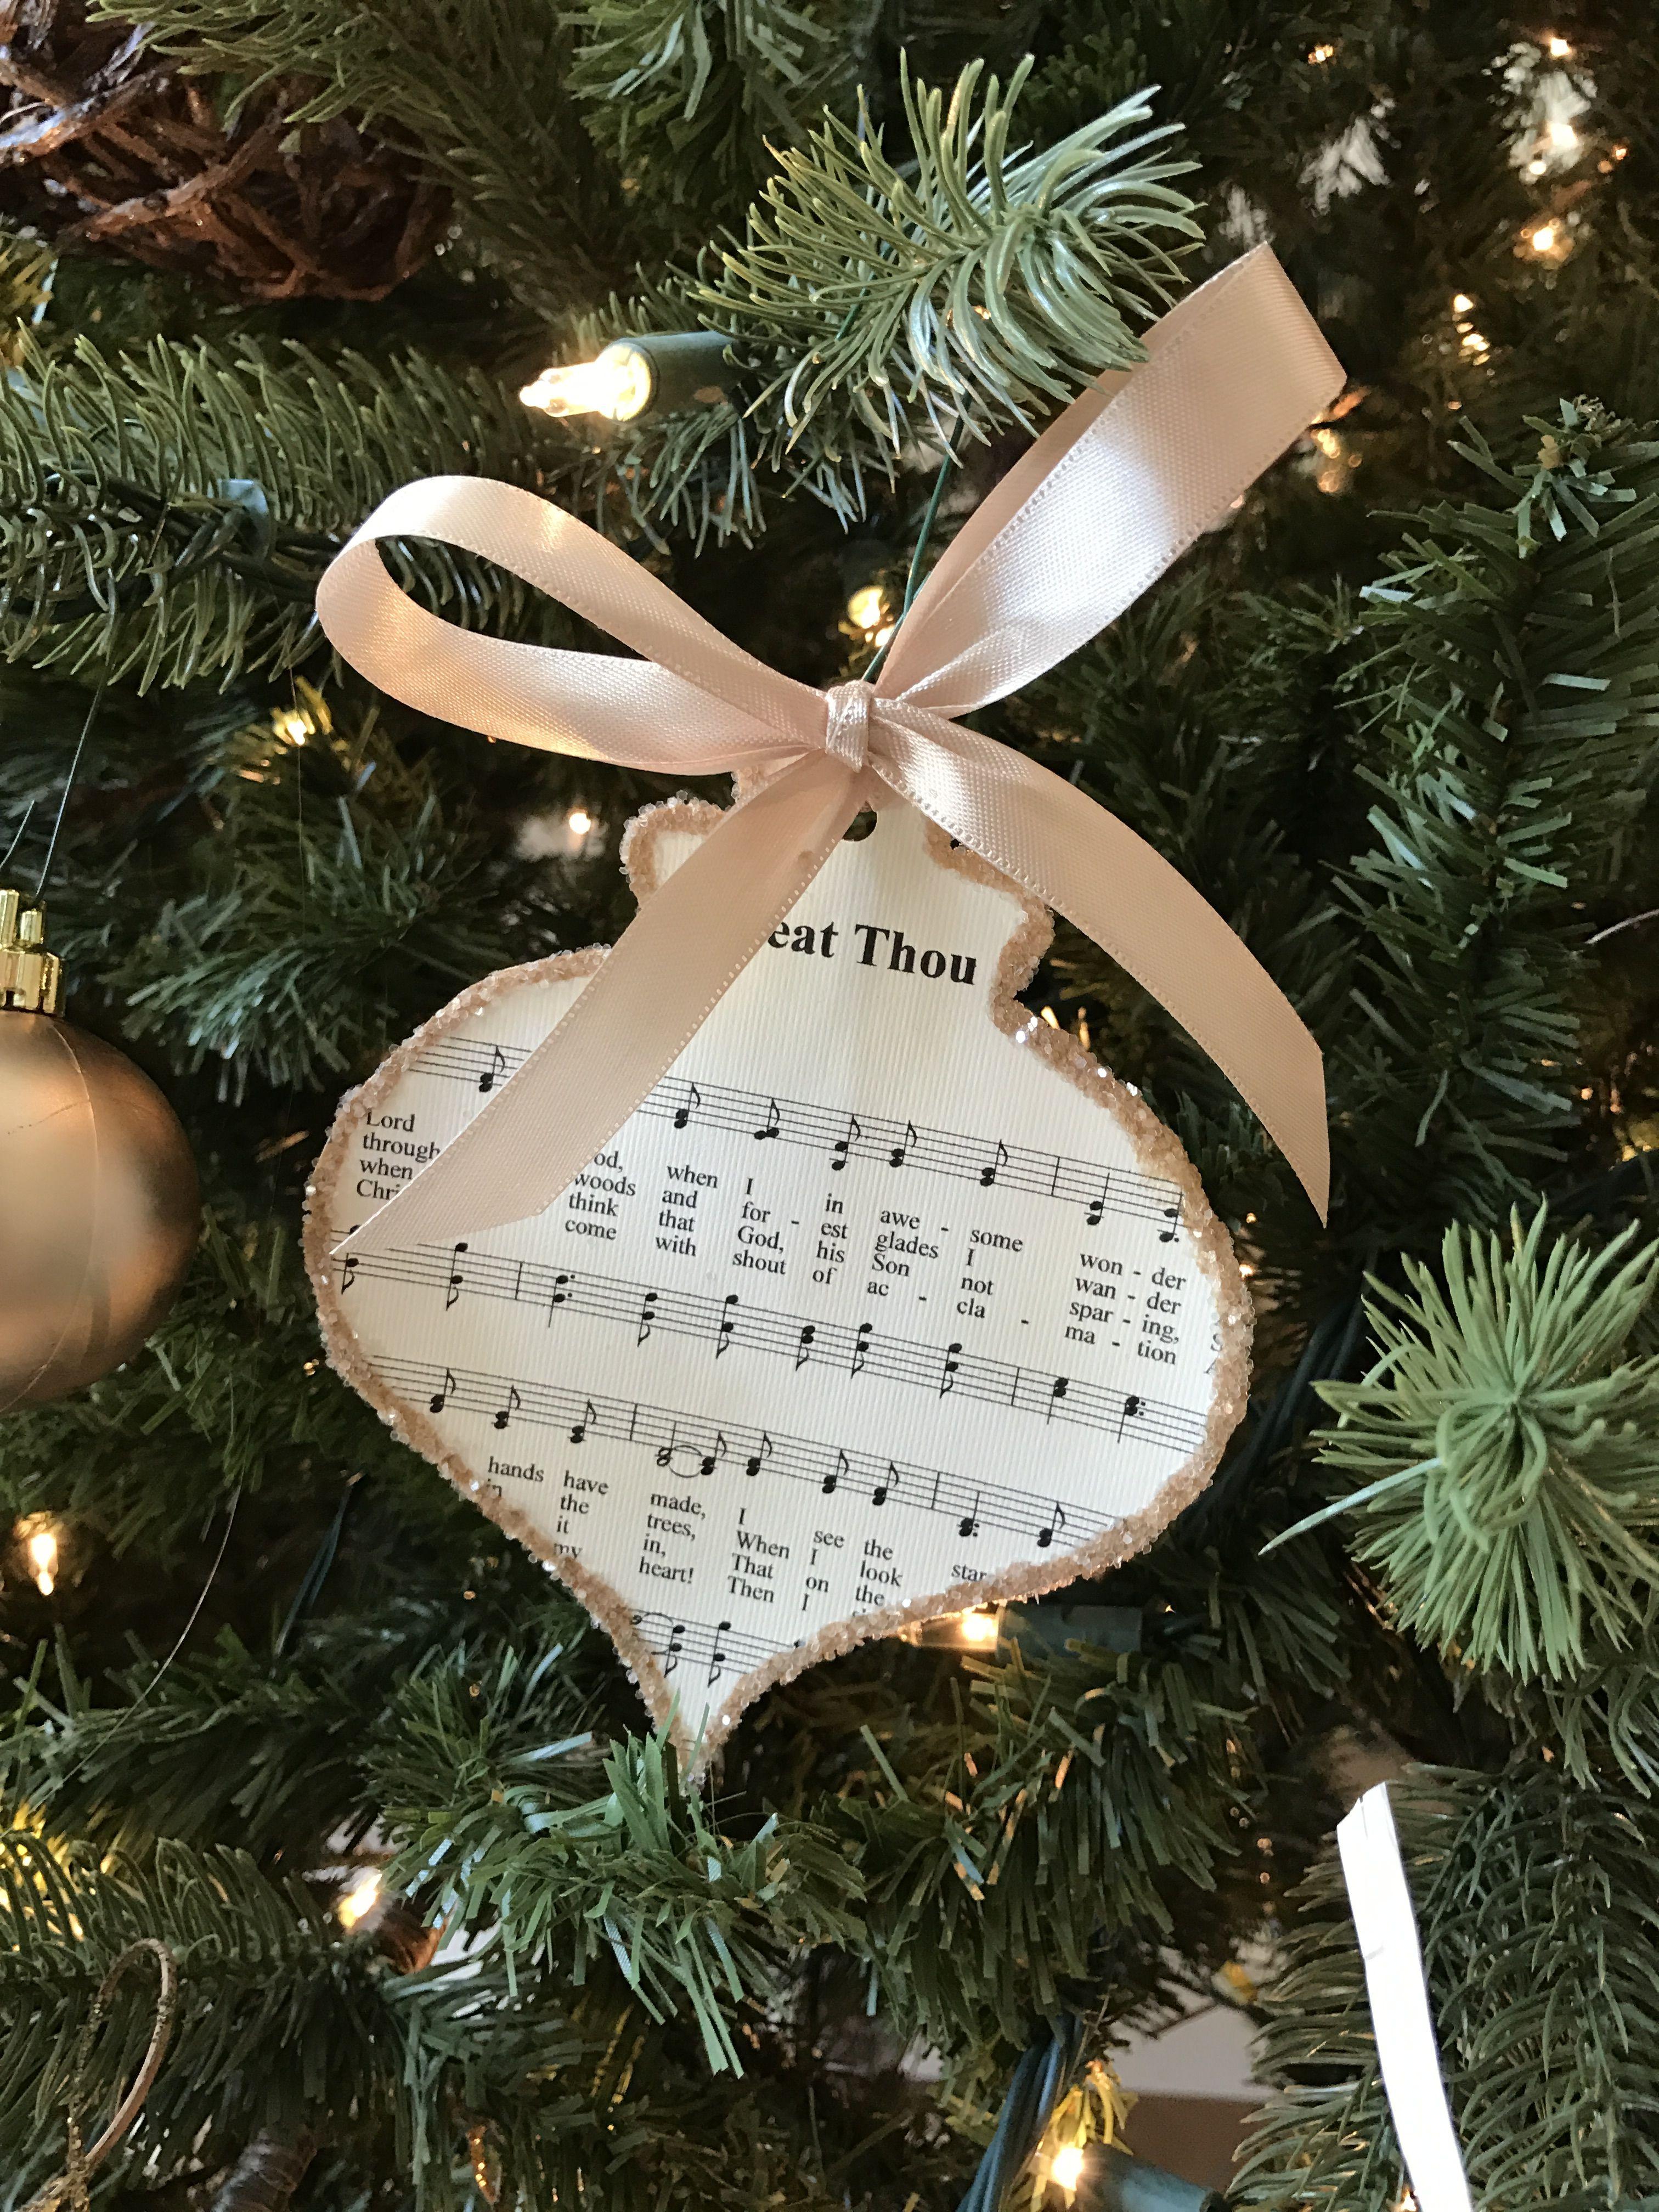 Sheet Music Ornaments Music Christmas Ornaments Christmas Crafts Christmas Ornament Crafts